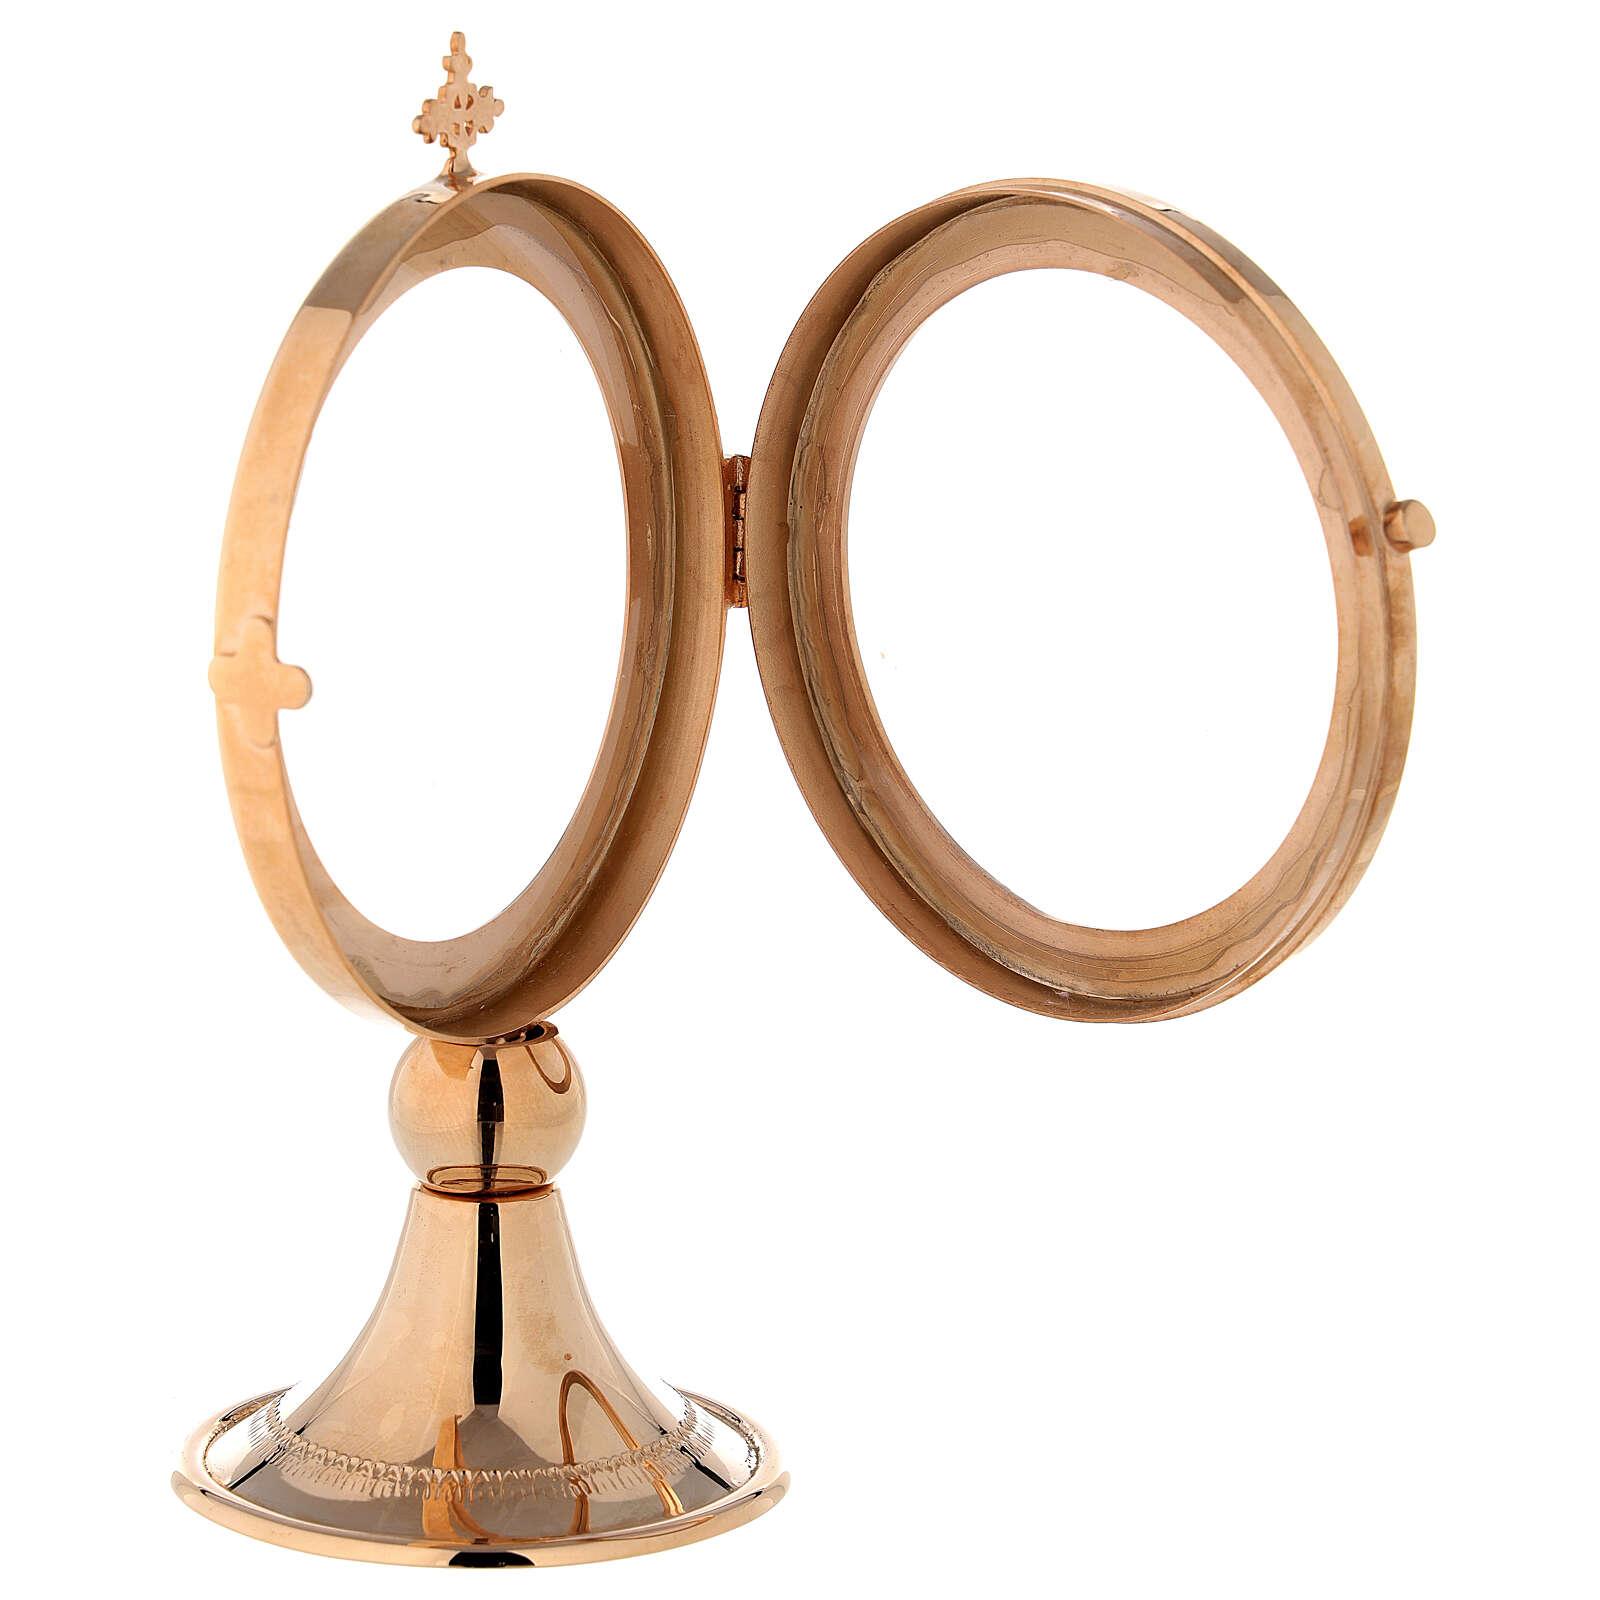 Teca ostensorio diam 8 cm ottone dorato Monaci Betlemme 4